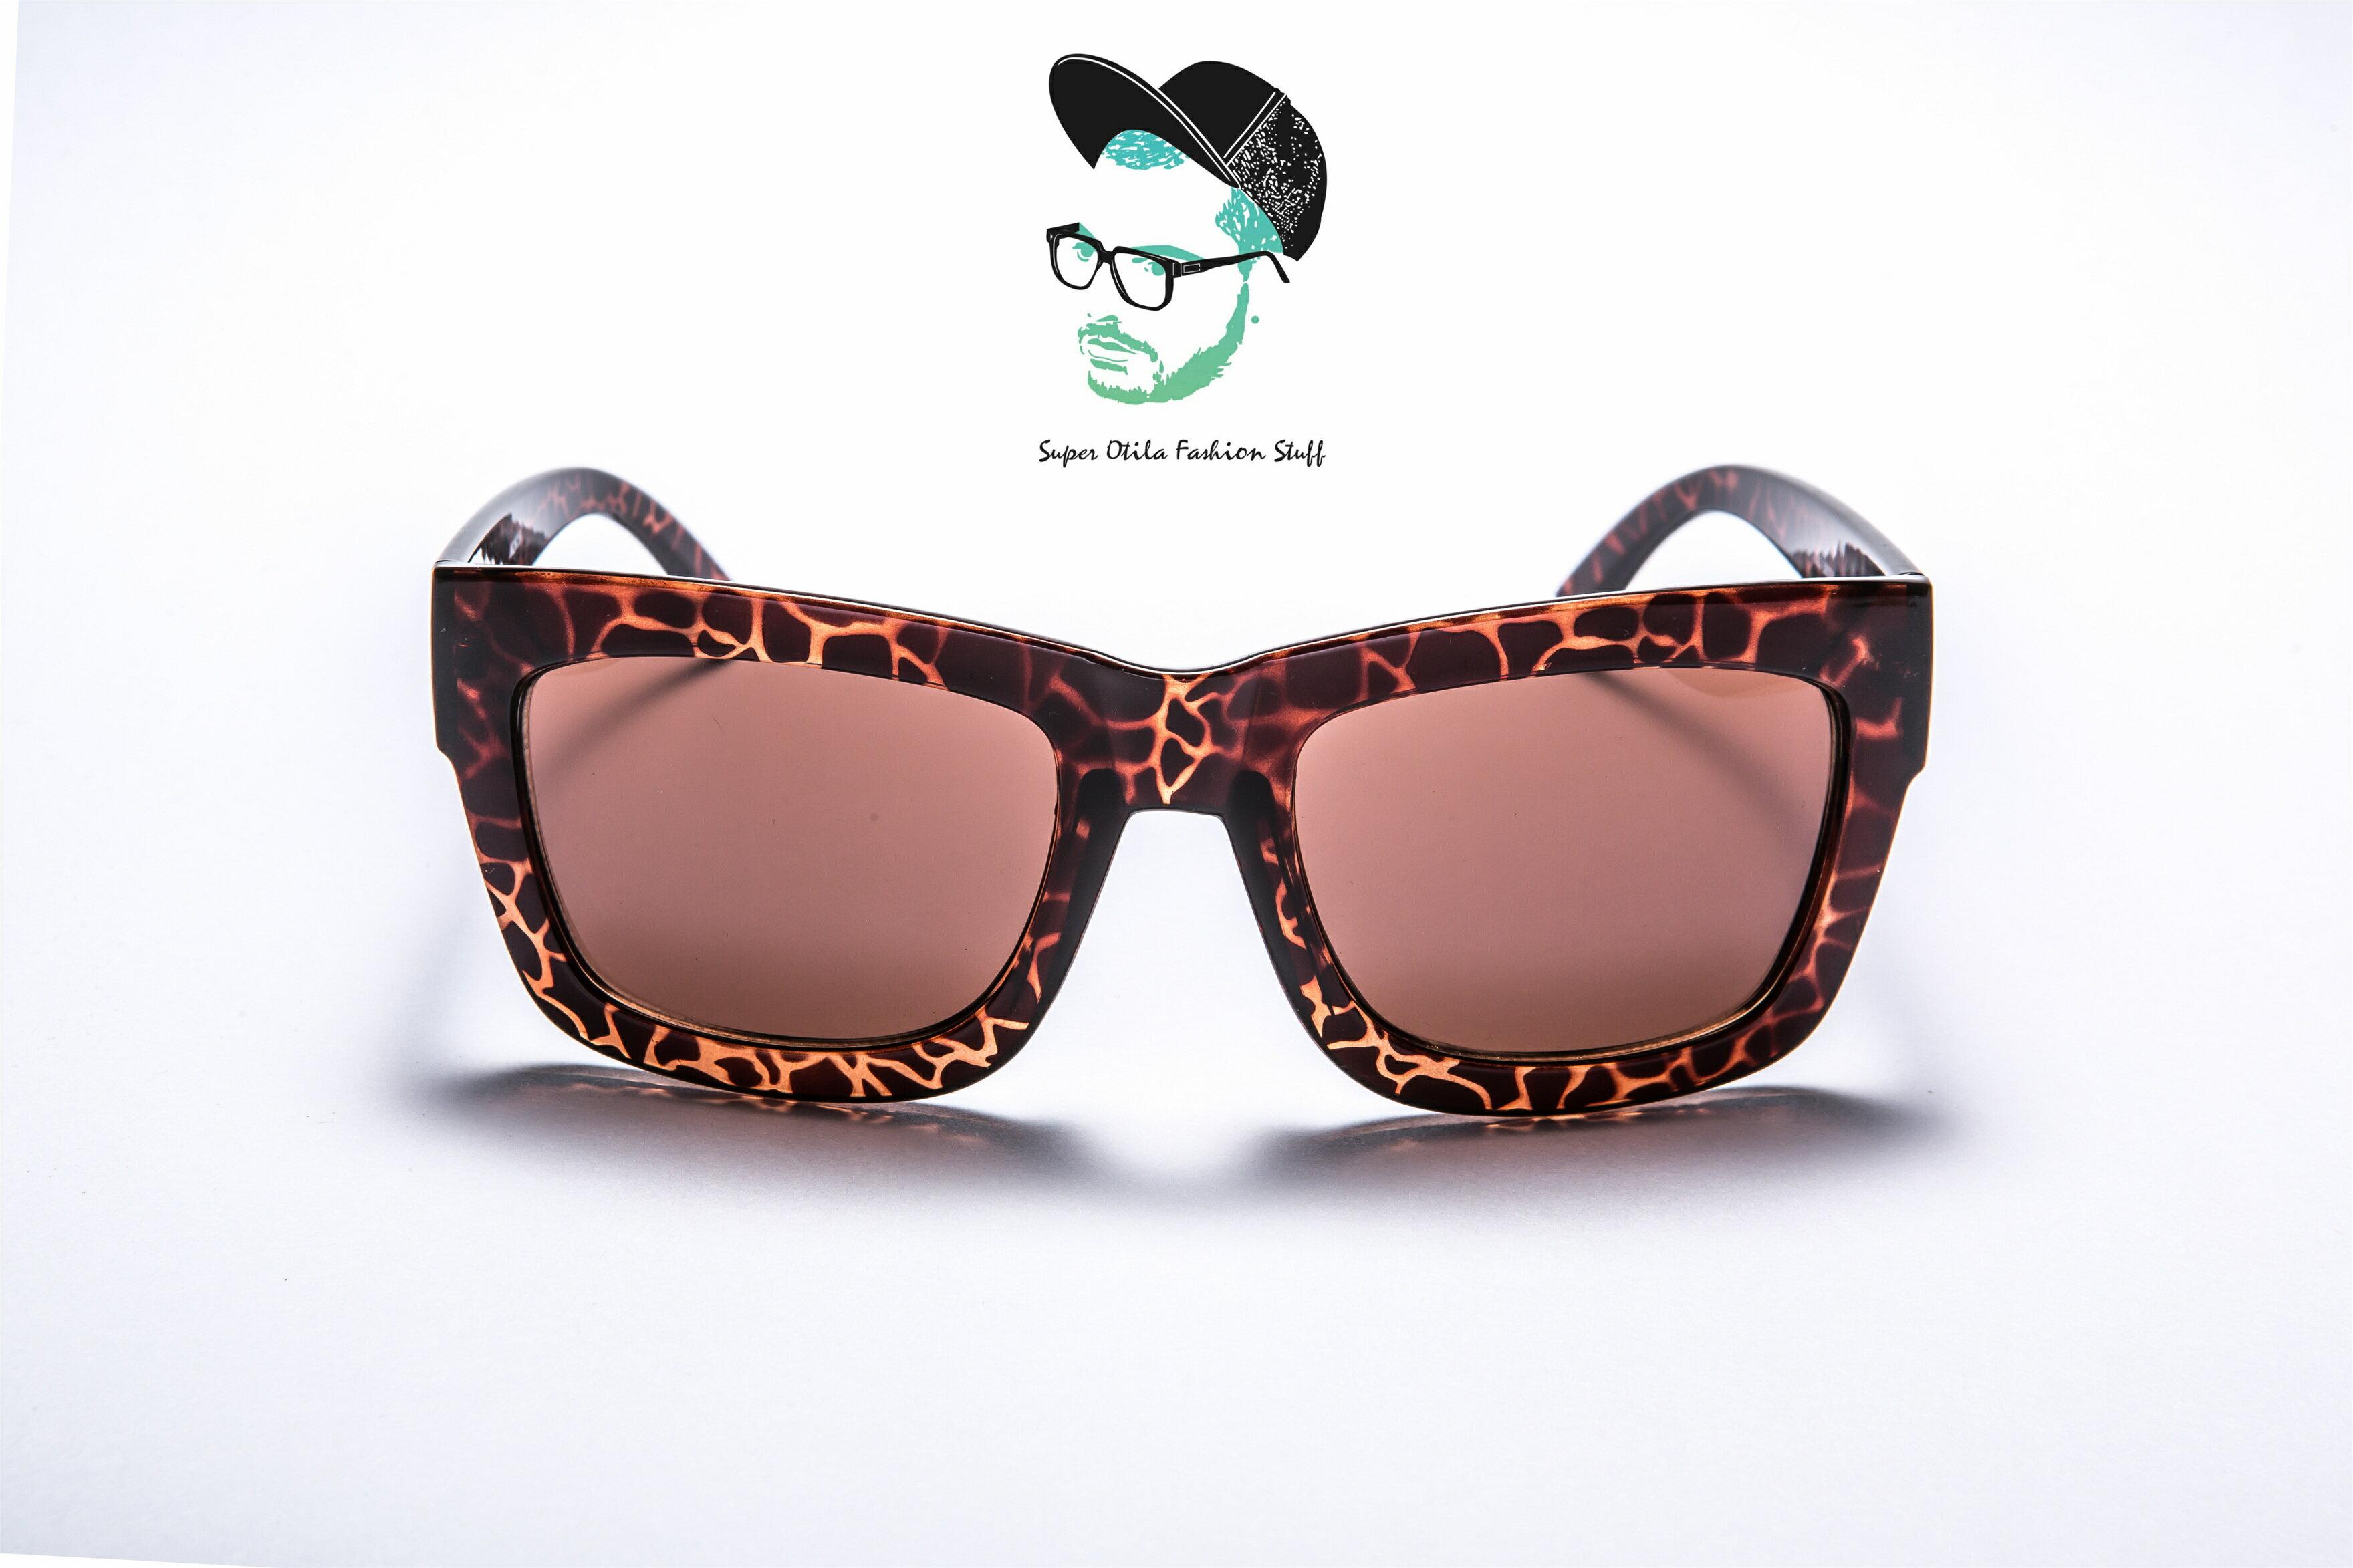 glasses for lovers 太陽眼鏡 墨鏡 眼鏡  韓國 【2033】簡約風-加大-墨鏡